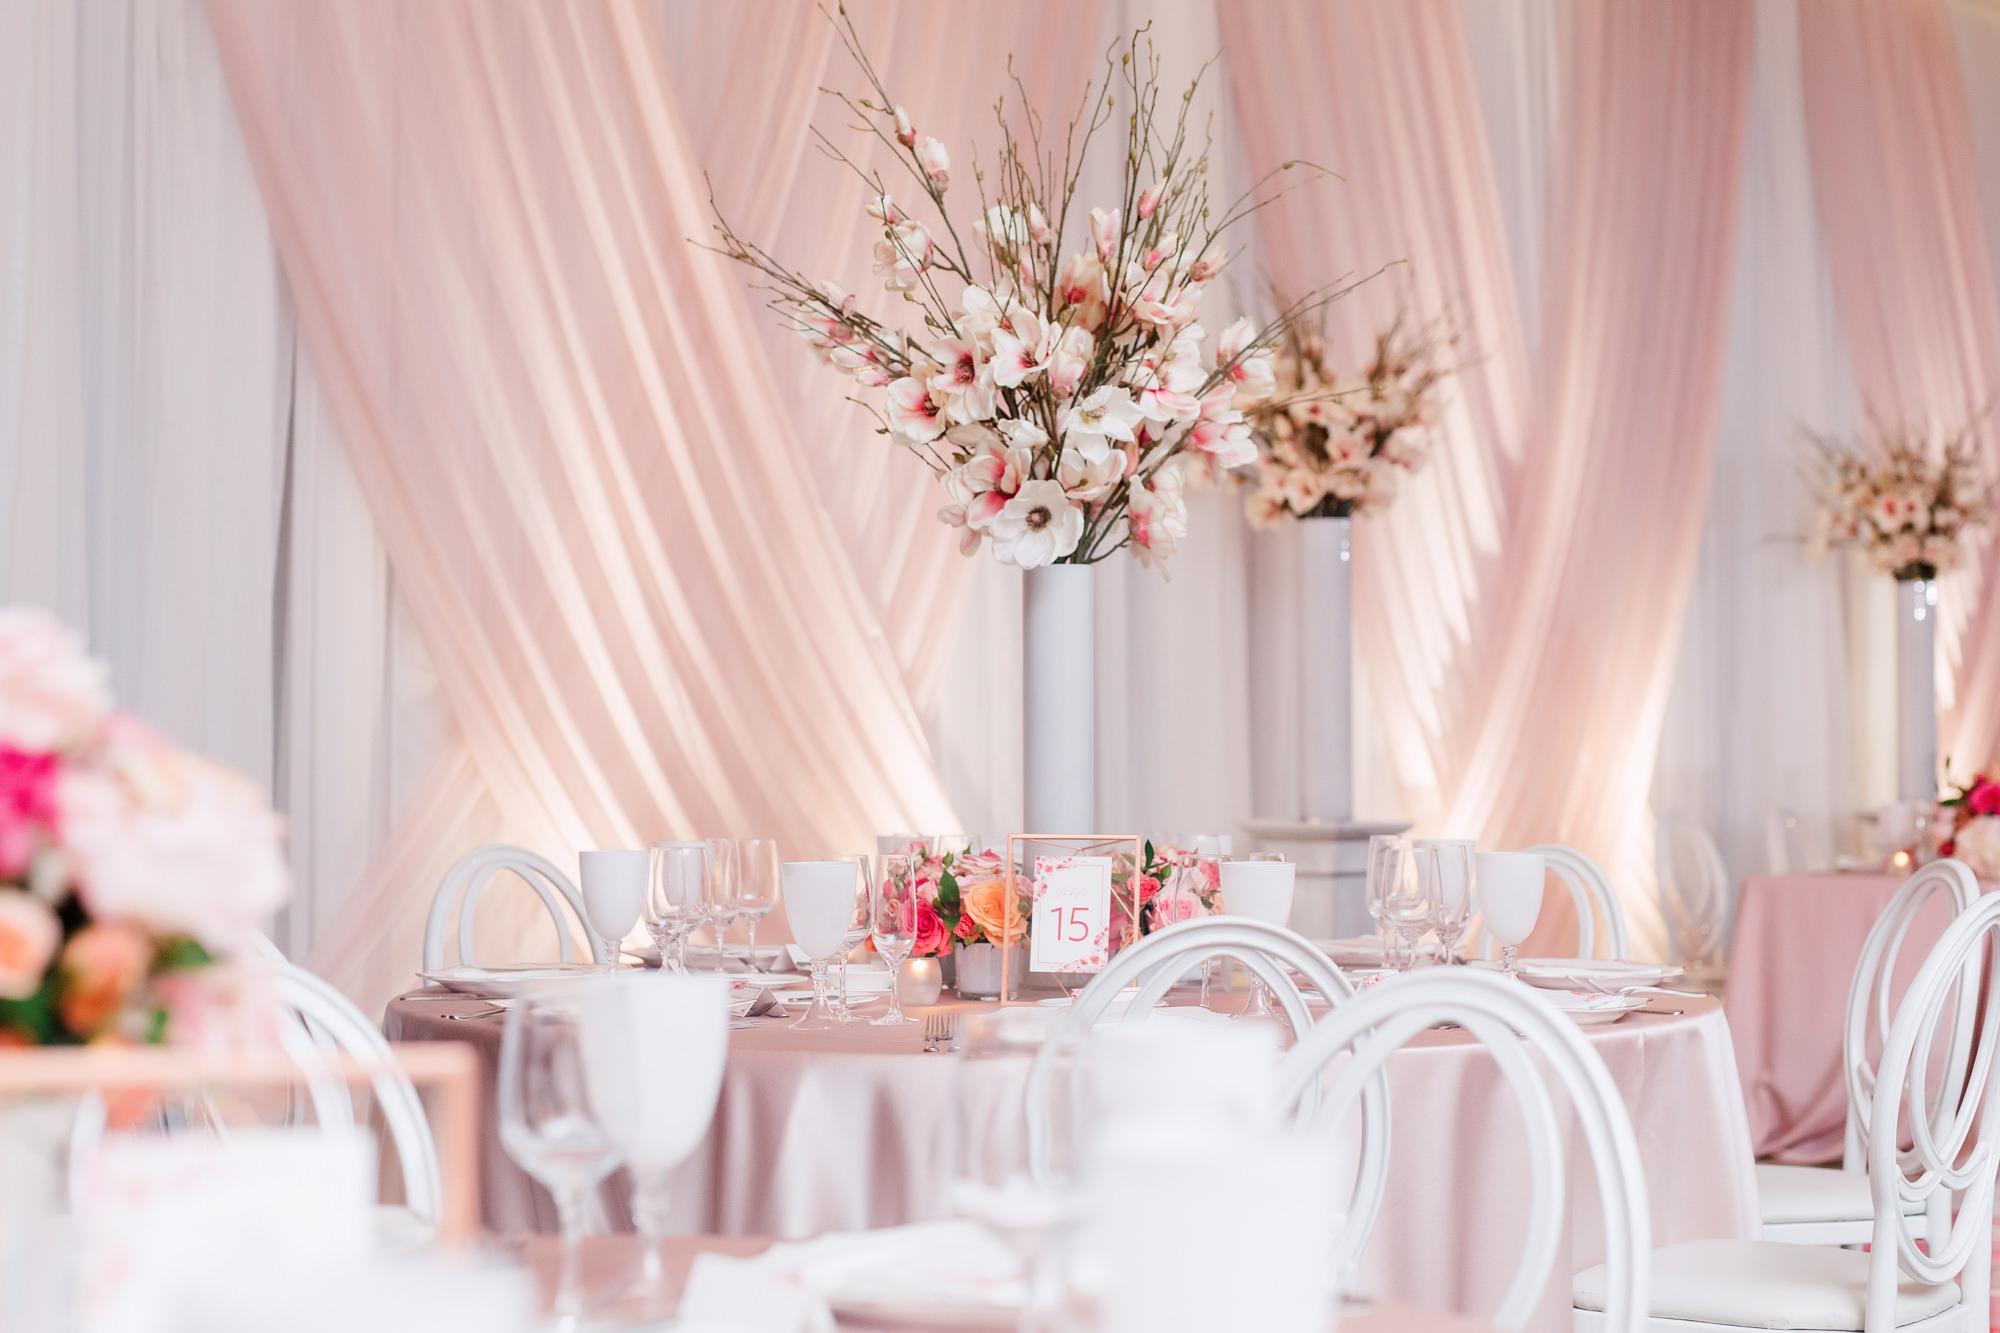 rose petal decor